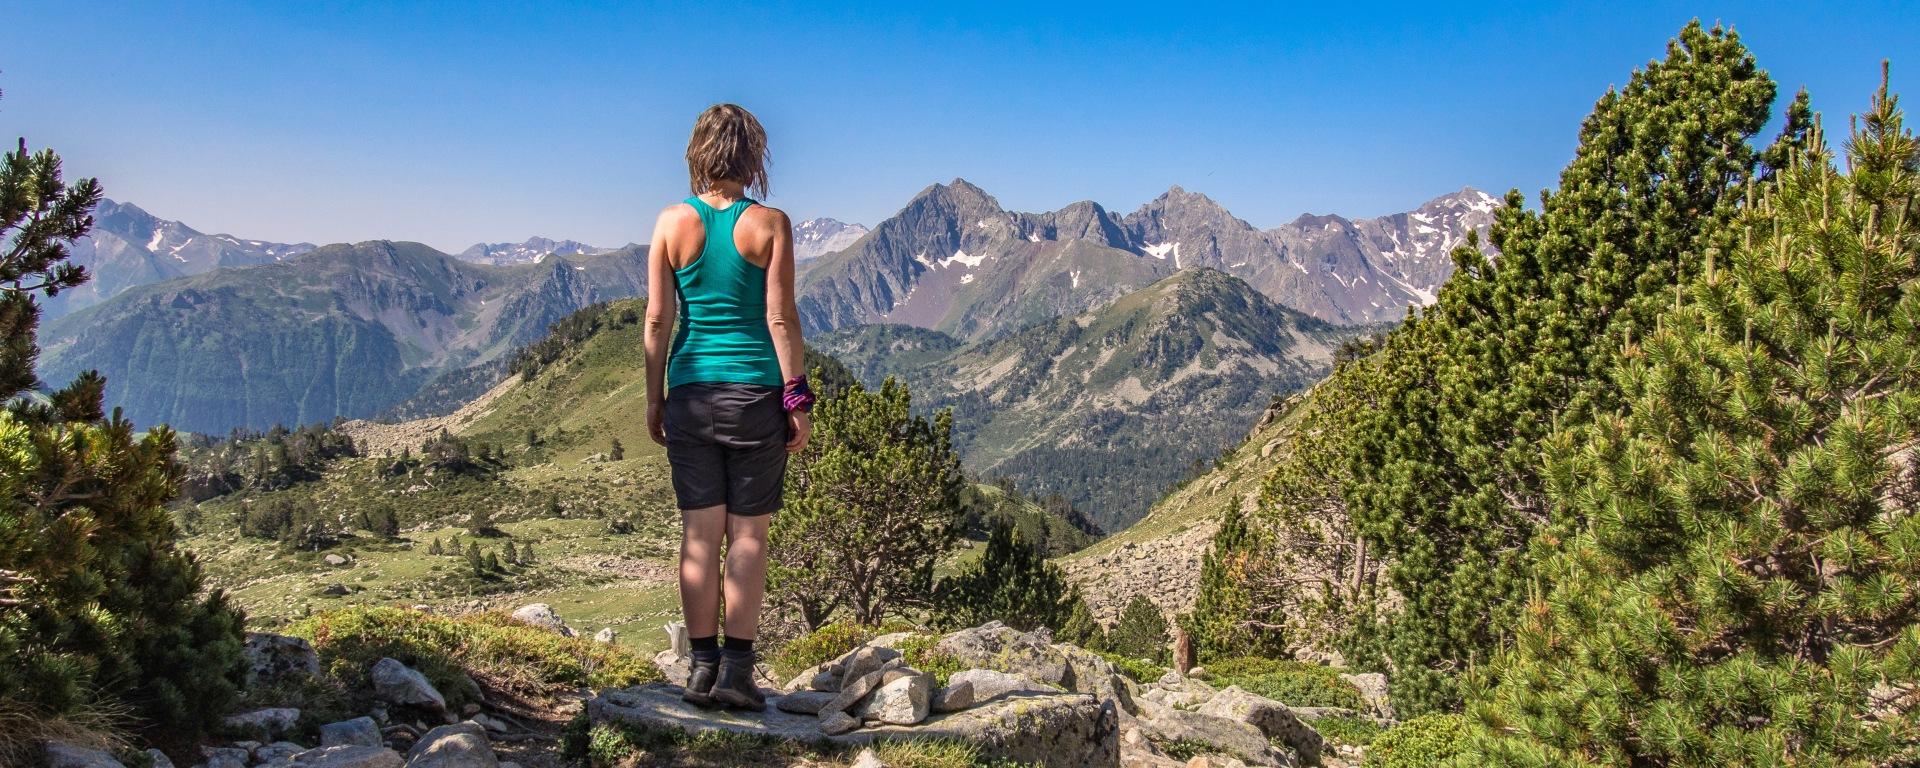 Col de Bastanet szlak Pireneje